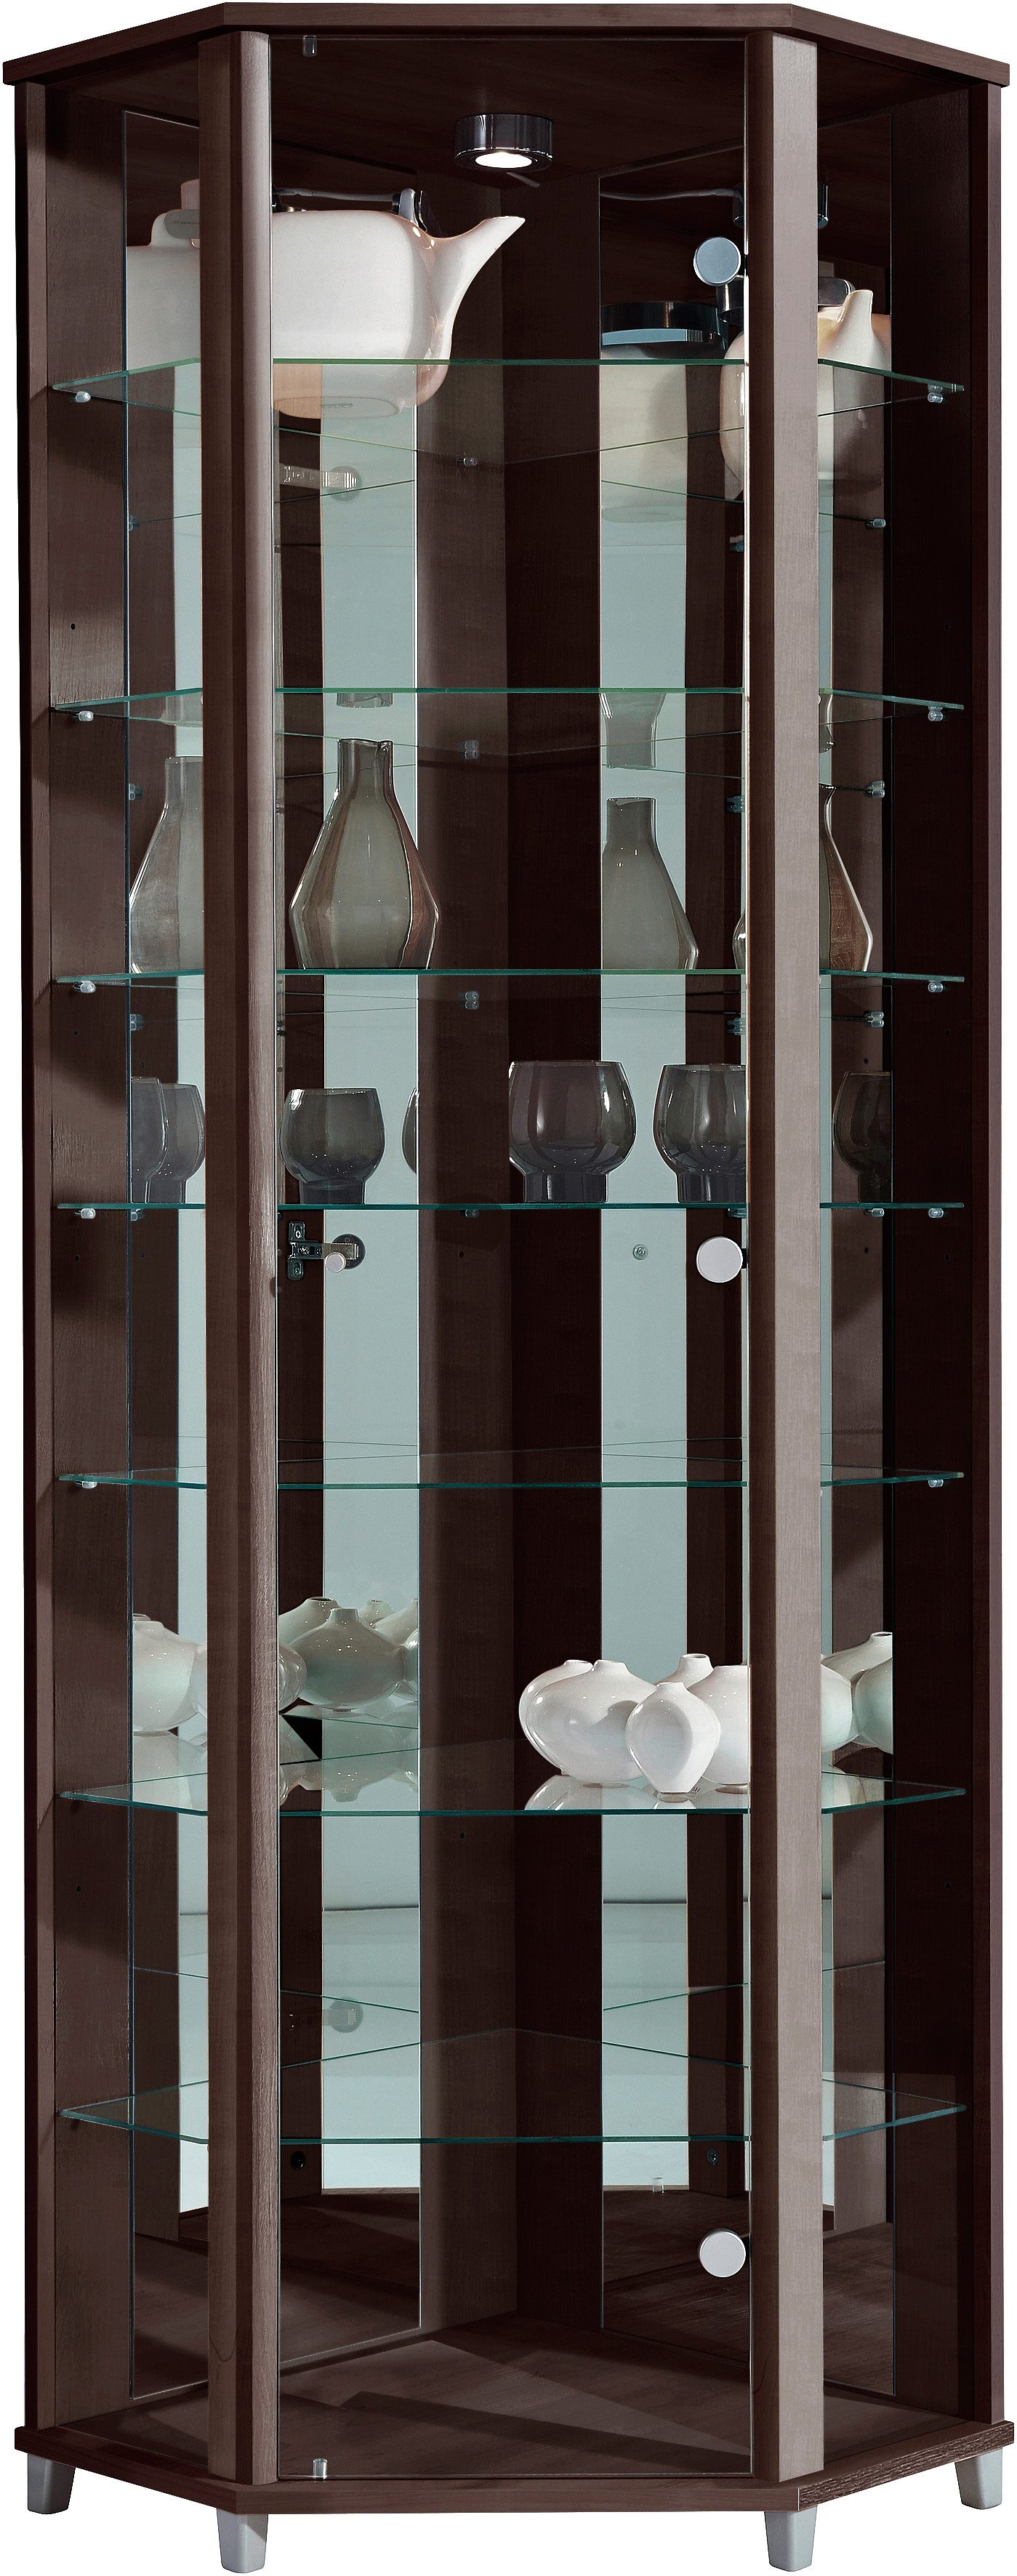 Eckvitrine, Höhe 172 cm, 7 Glasböden | Wohnzimmer > Vitrinen > Eckvitrinen | Braun | Melamin | QUELLE